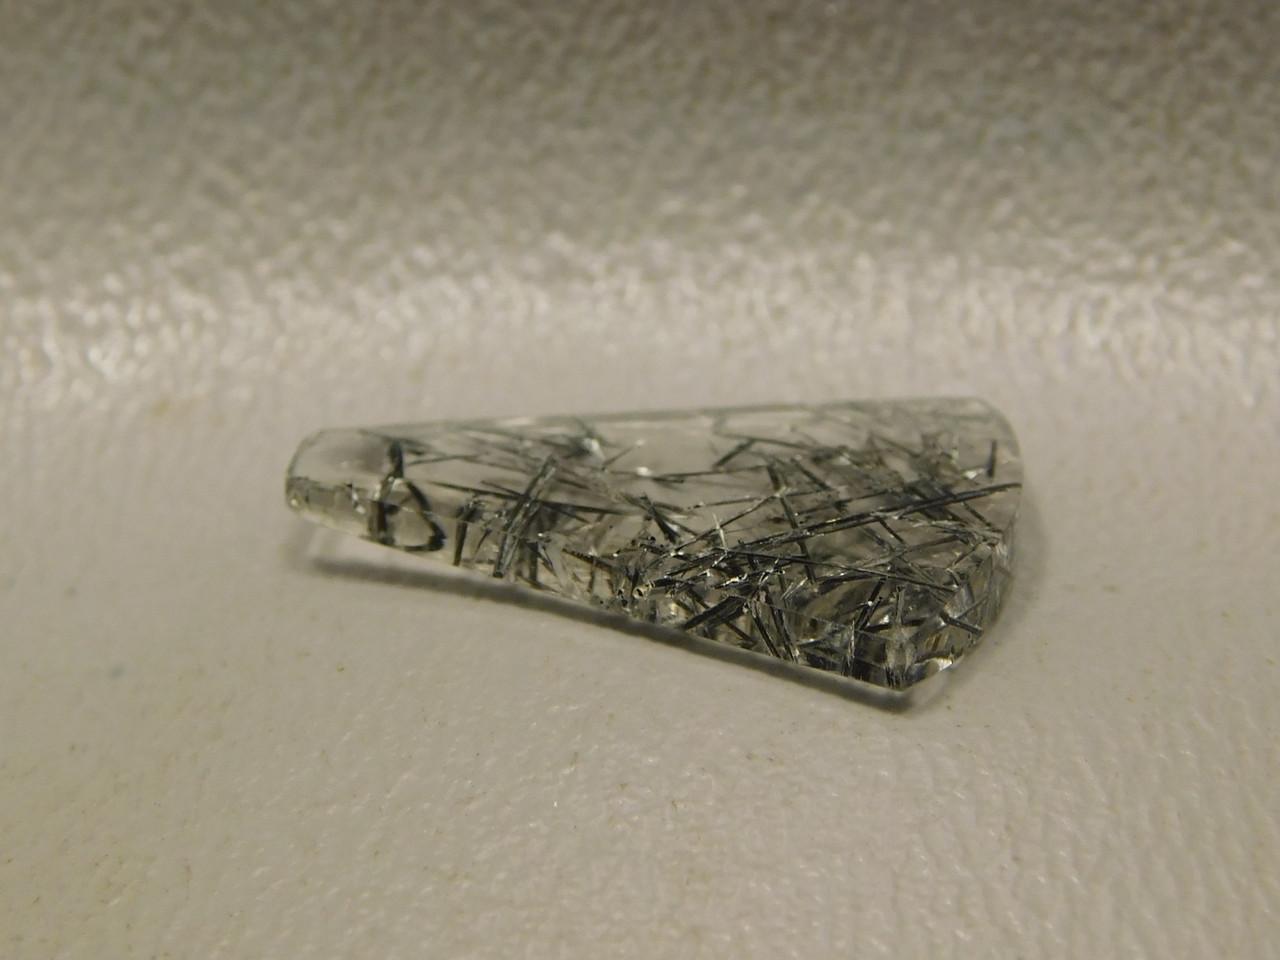 Tourmalined Quartz Small Cabochon Jewelry Making Supplies #20